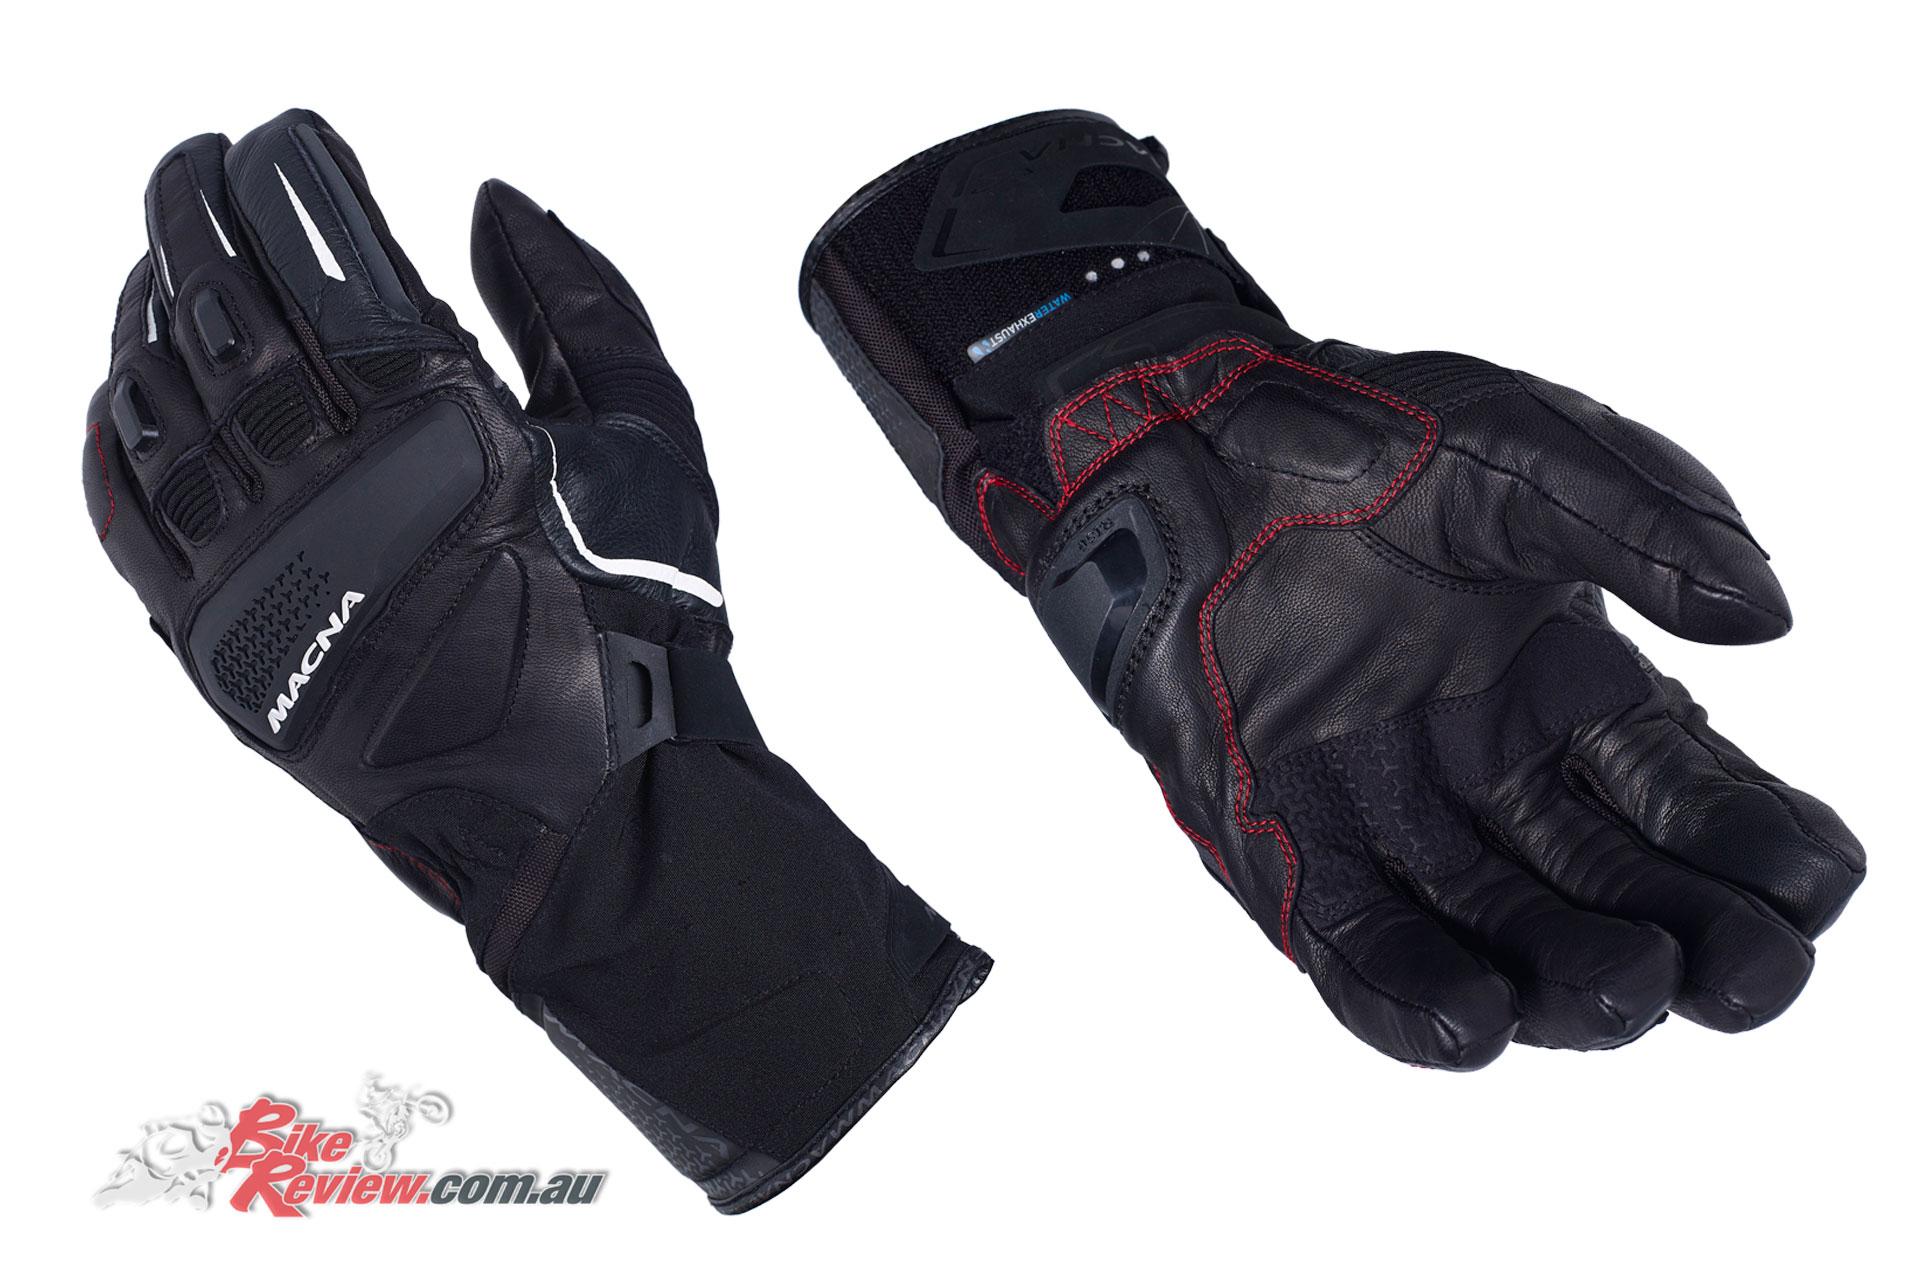 Macna Fugitive Gloves - $189.95 RRP